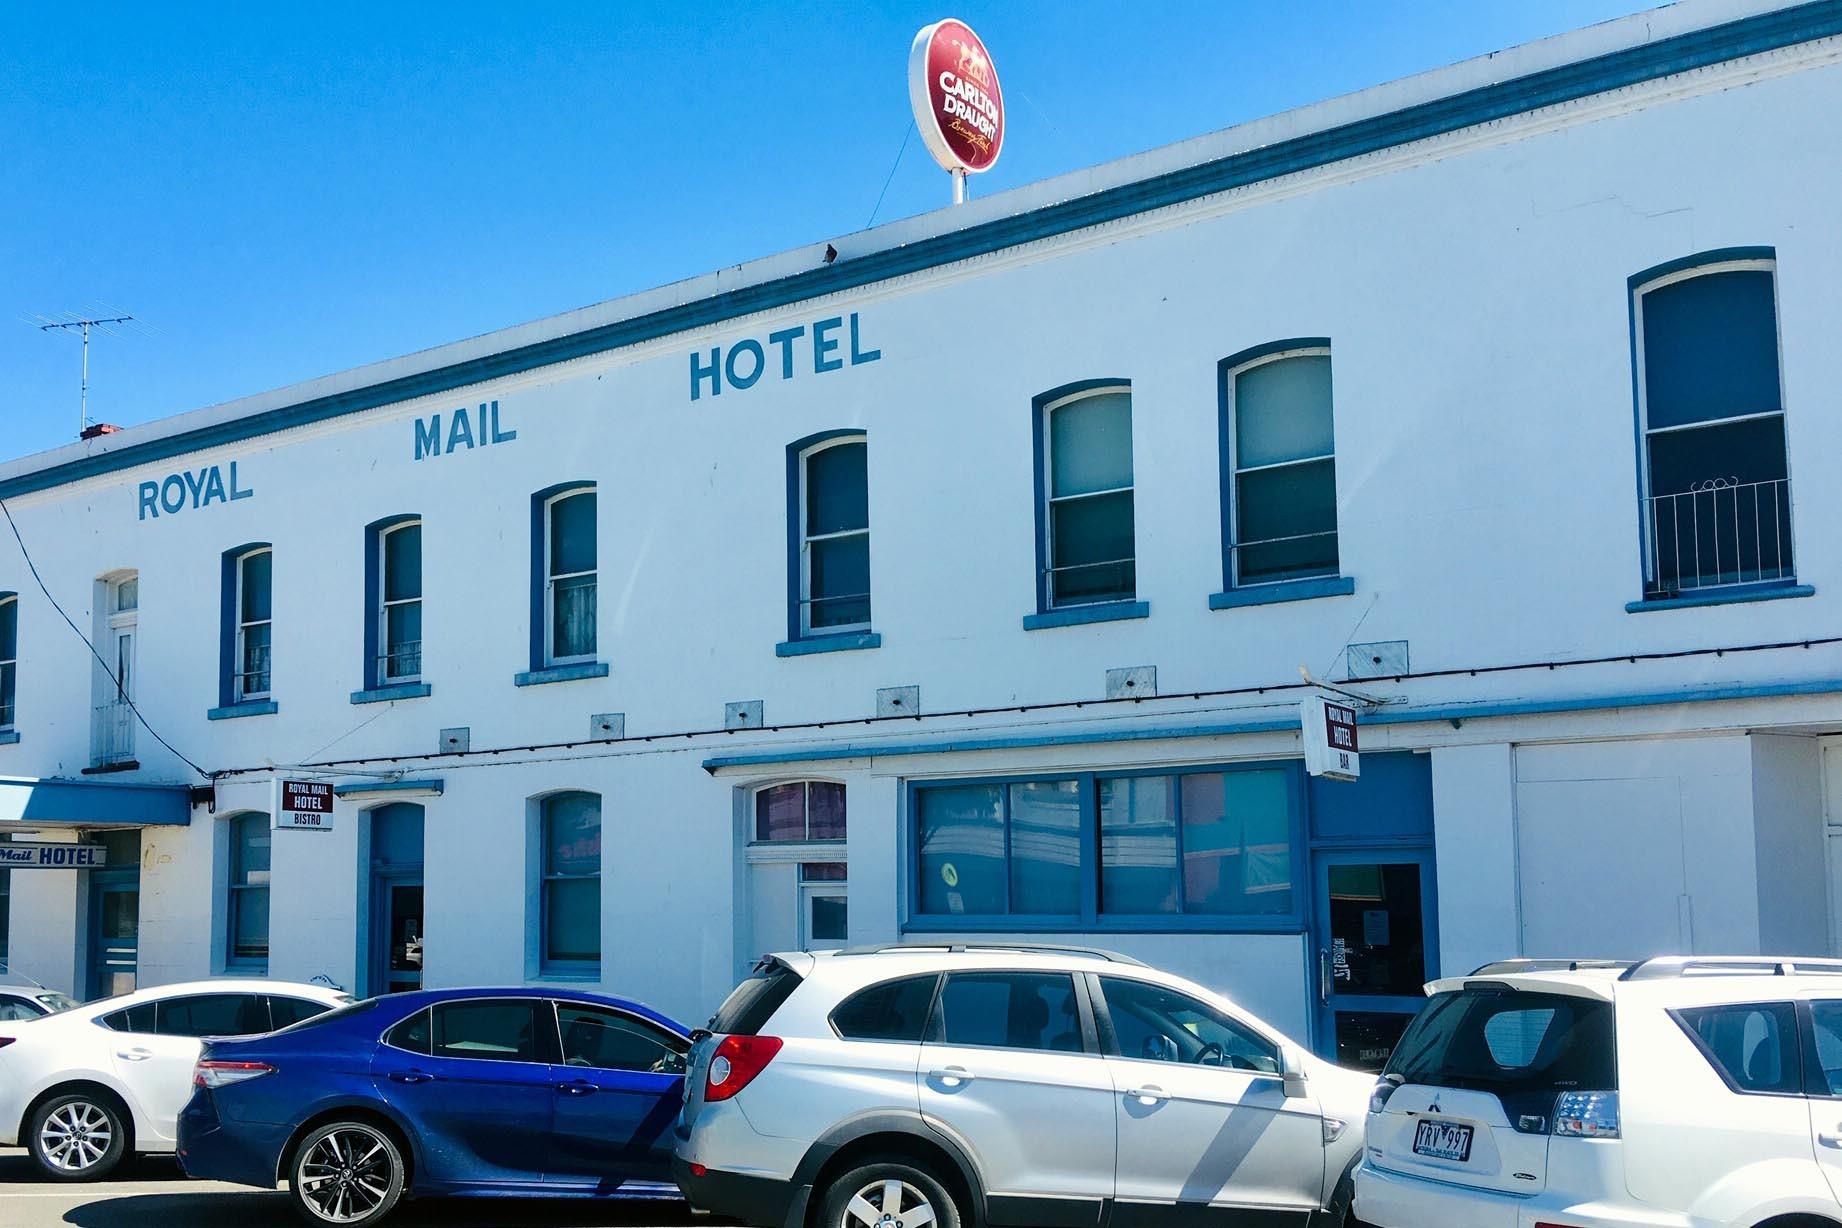 i - Royal Mail Hotel